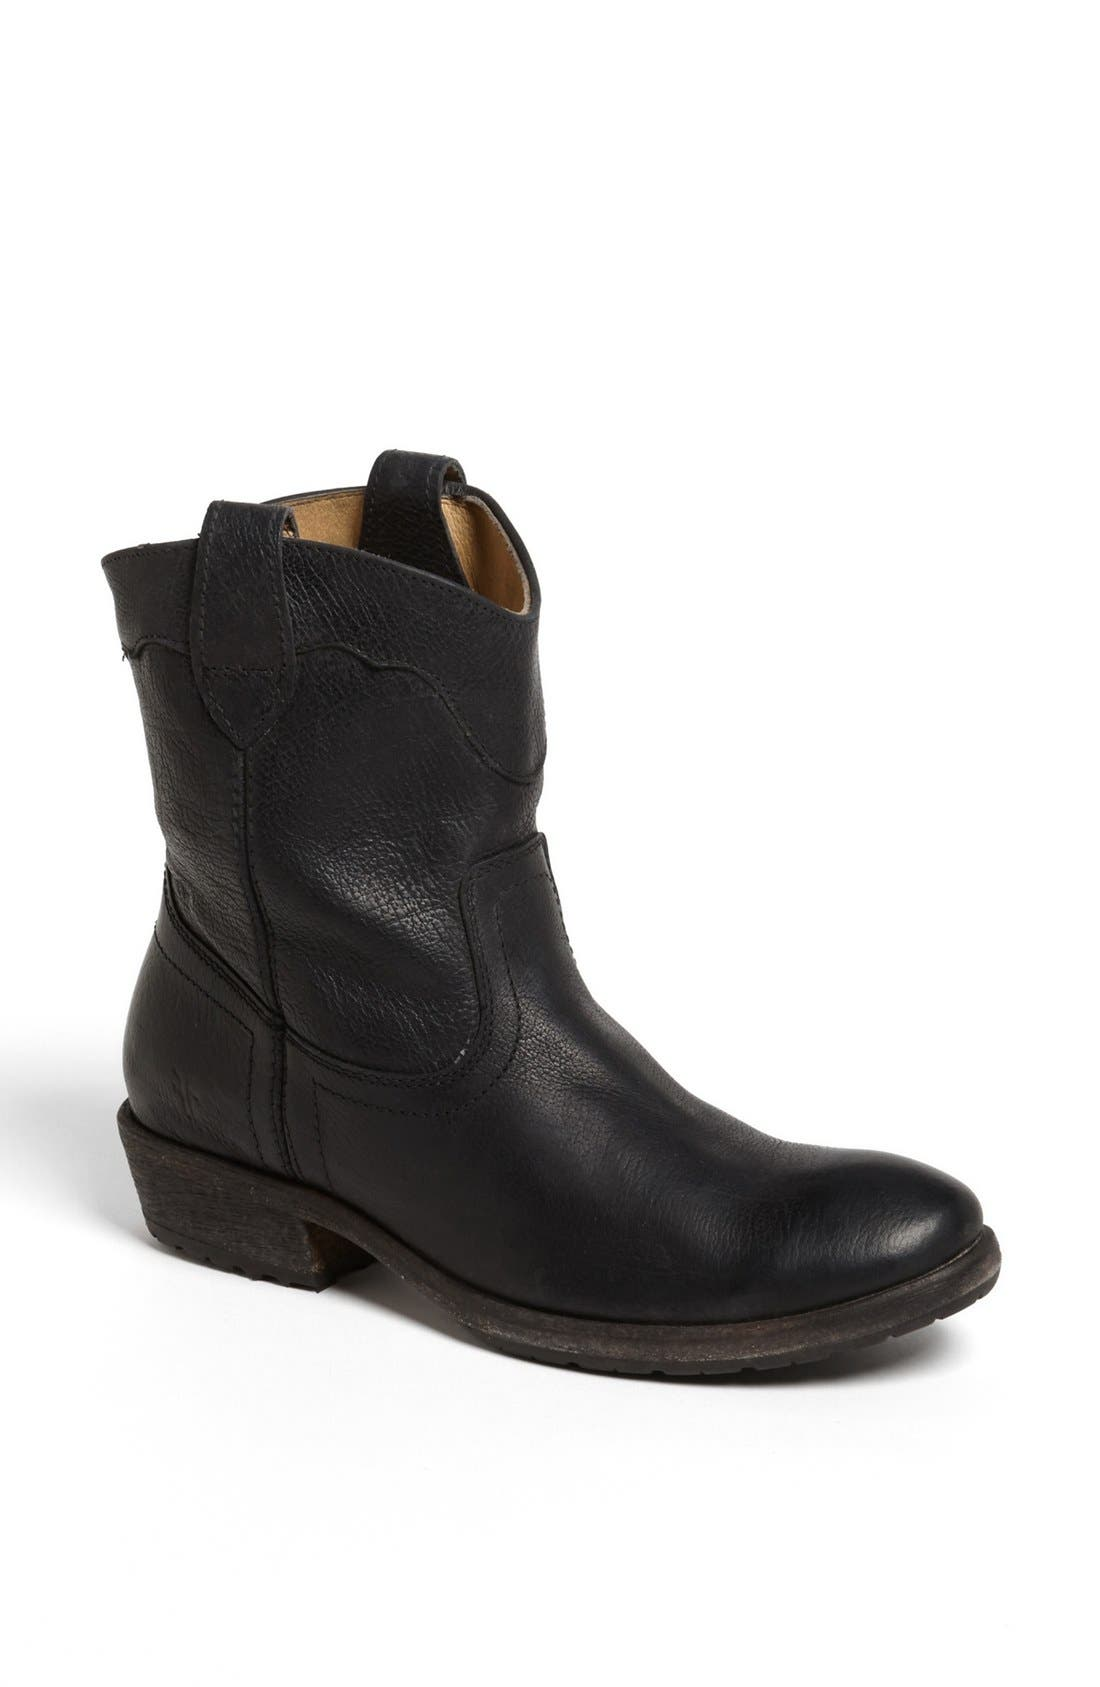 Main Image - Frye 'Carson Lug' Short Boot